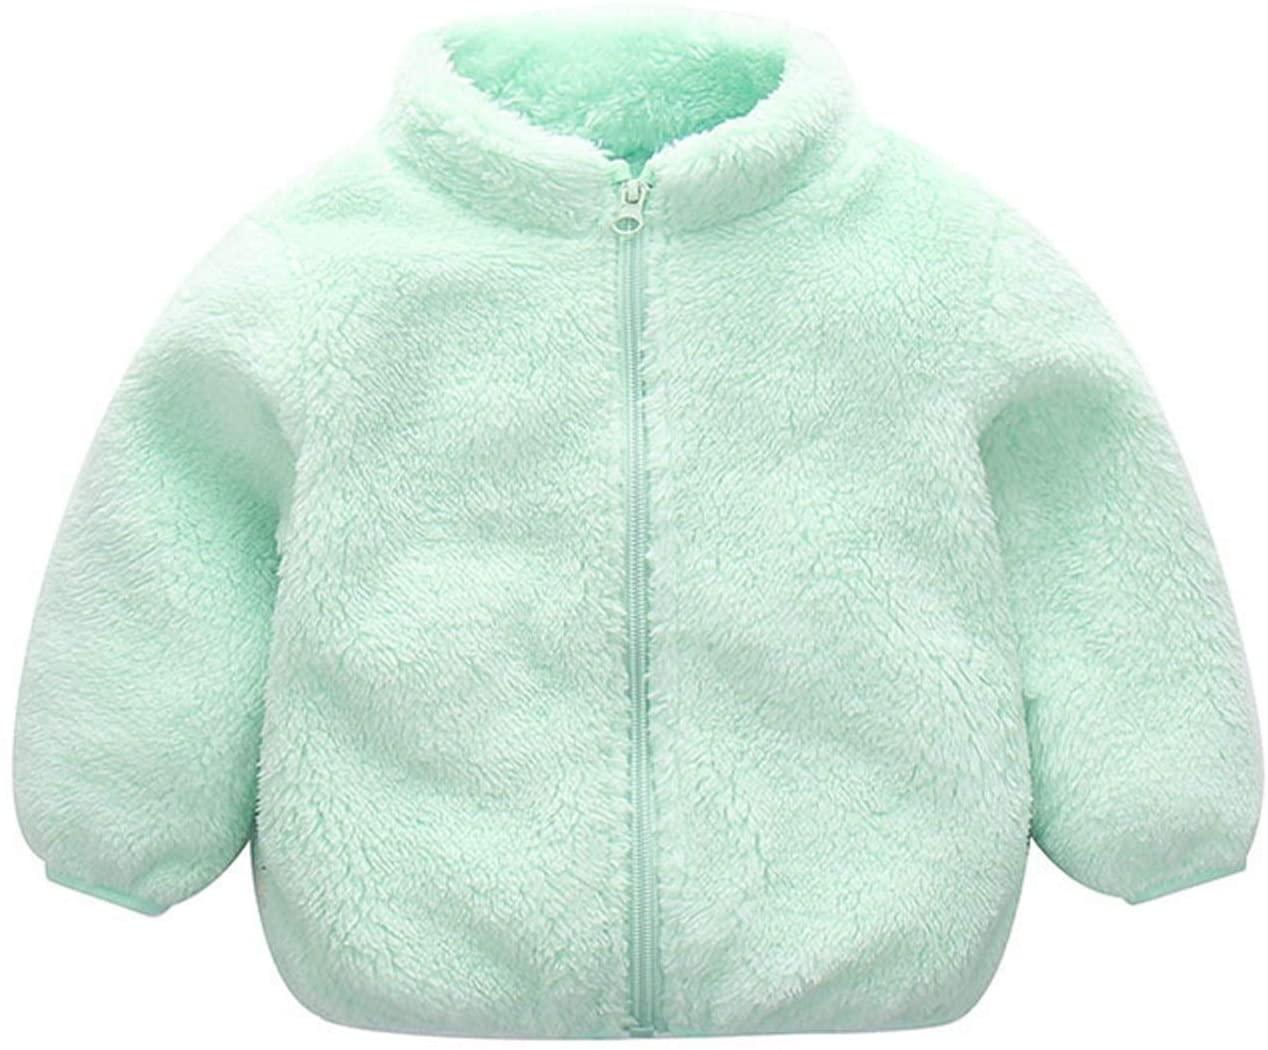 WICHENG 2020 Autumn Winter Baby Fleece Jacket Plus Velvet Warm Infant Girl Coat 0-6 Years Kids Toddler Boy Outerwear Newborn Coat (Color : Sky Blue, Kid Size : 12M)